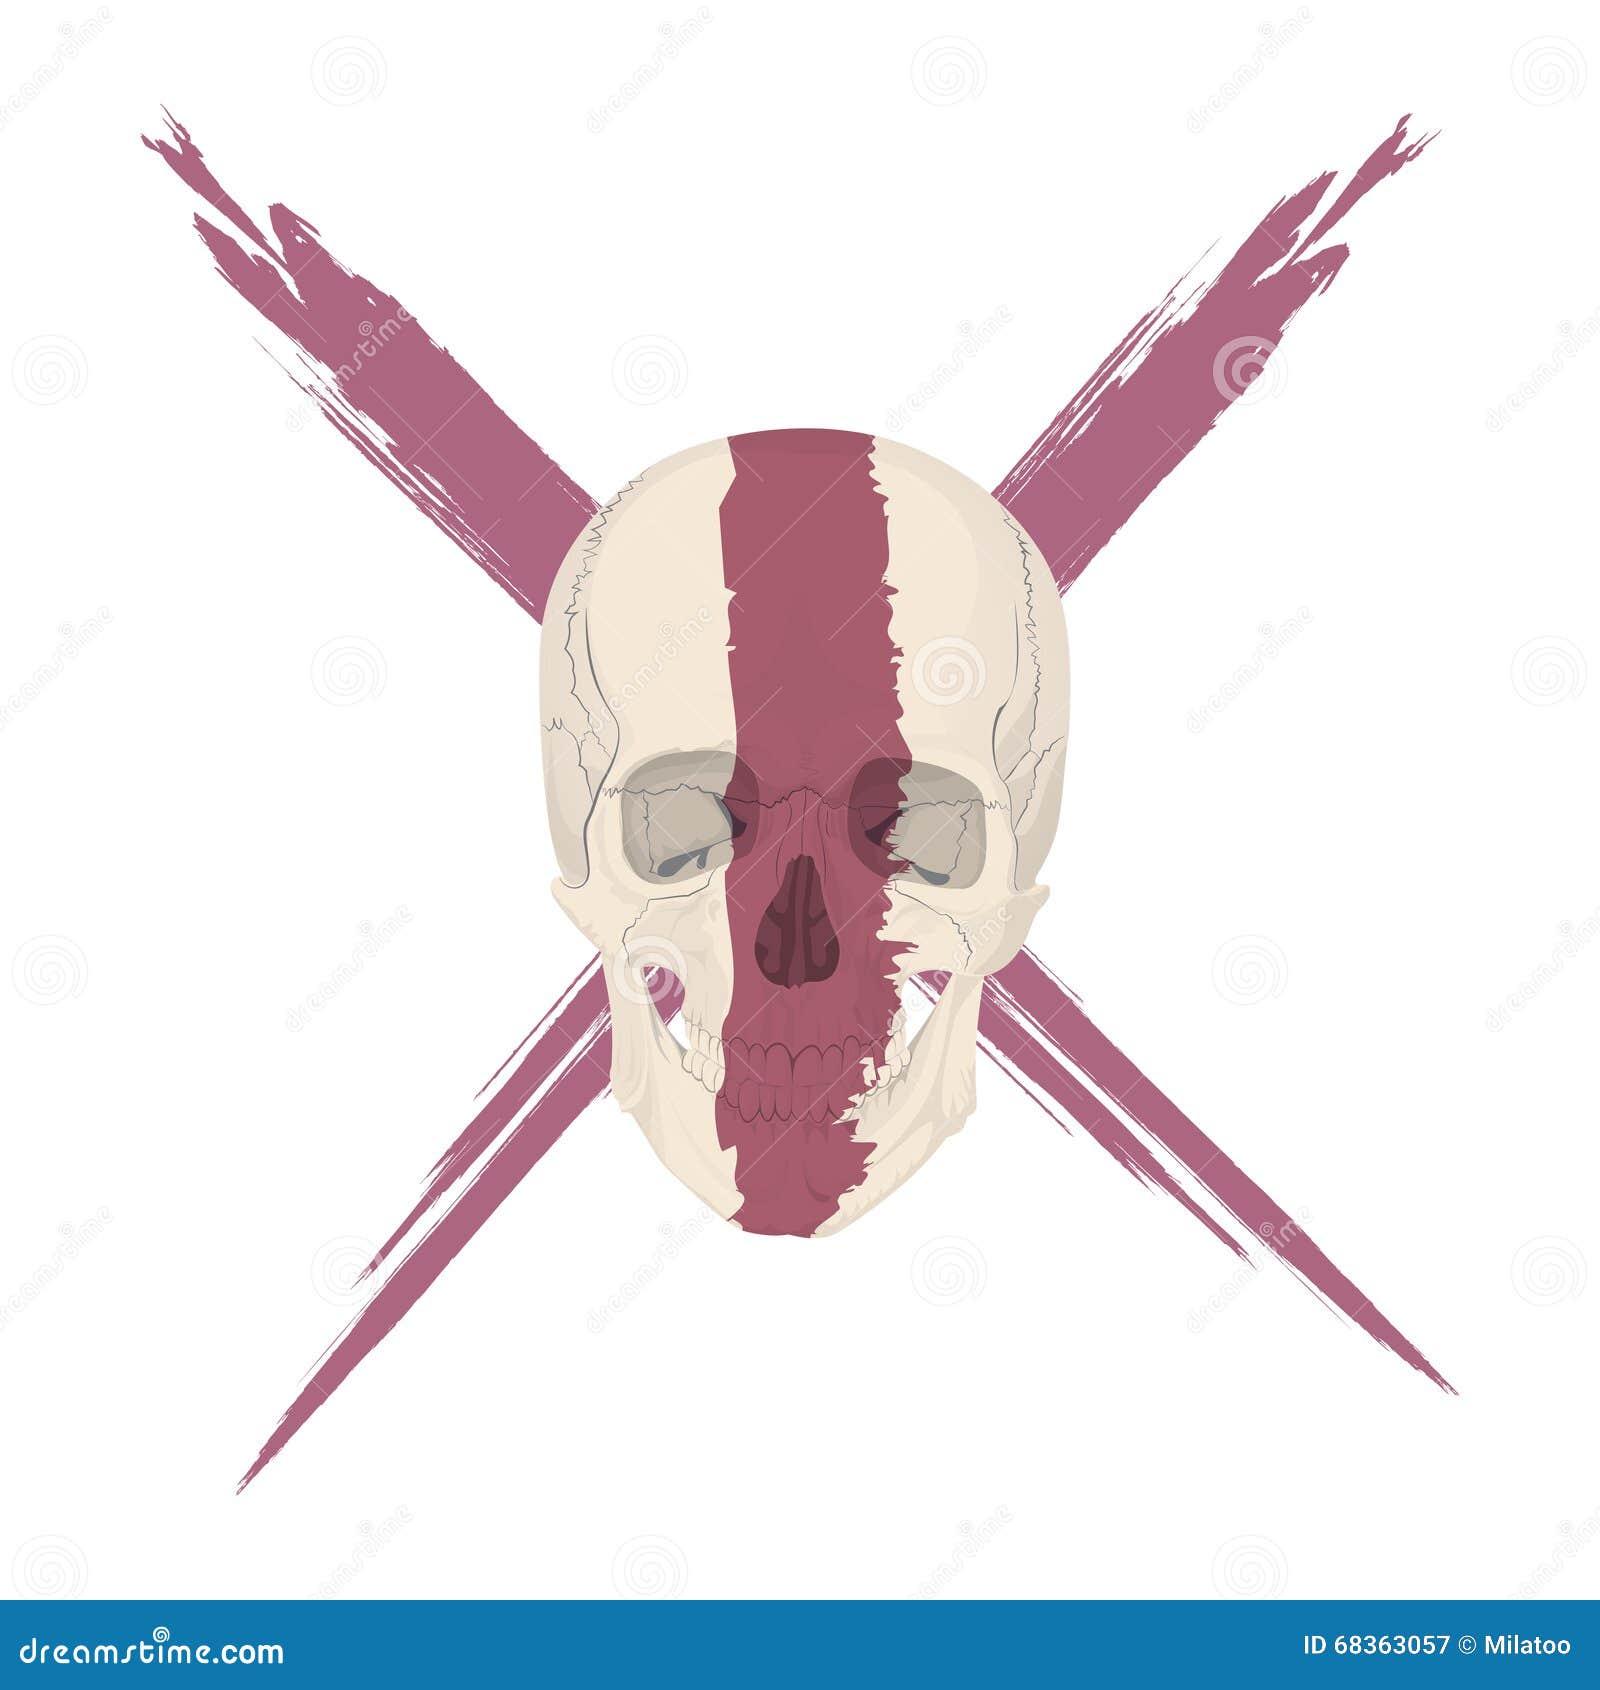 Human Skull Bones Skeleton Dead Stock Vector - Illustration of evil ...